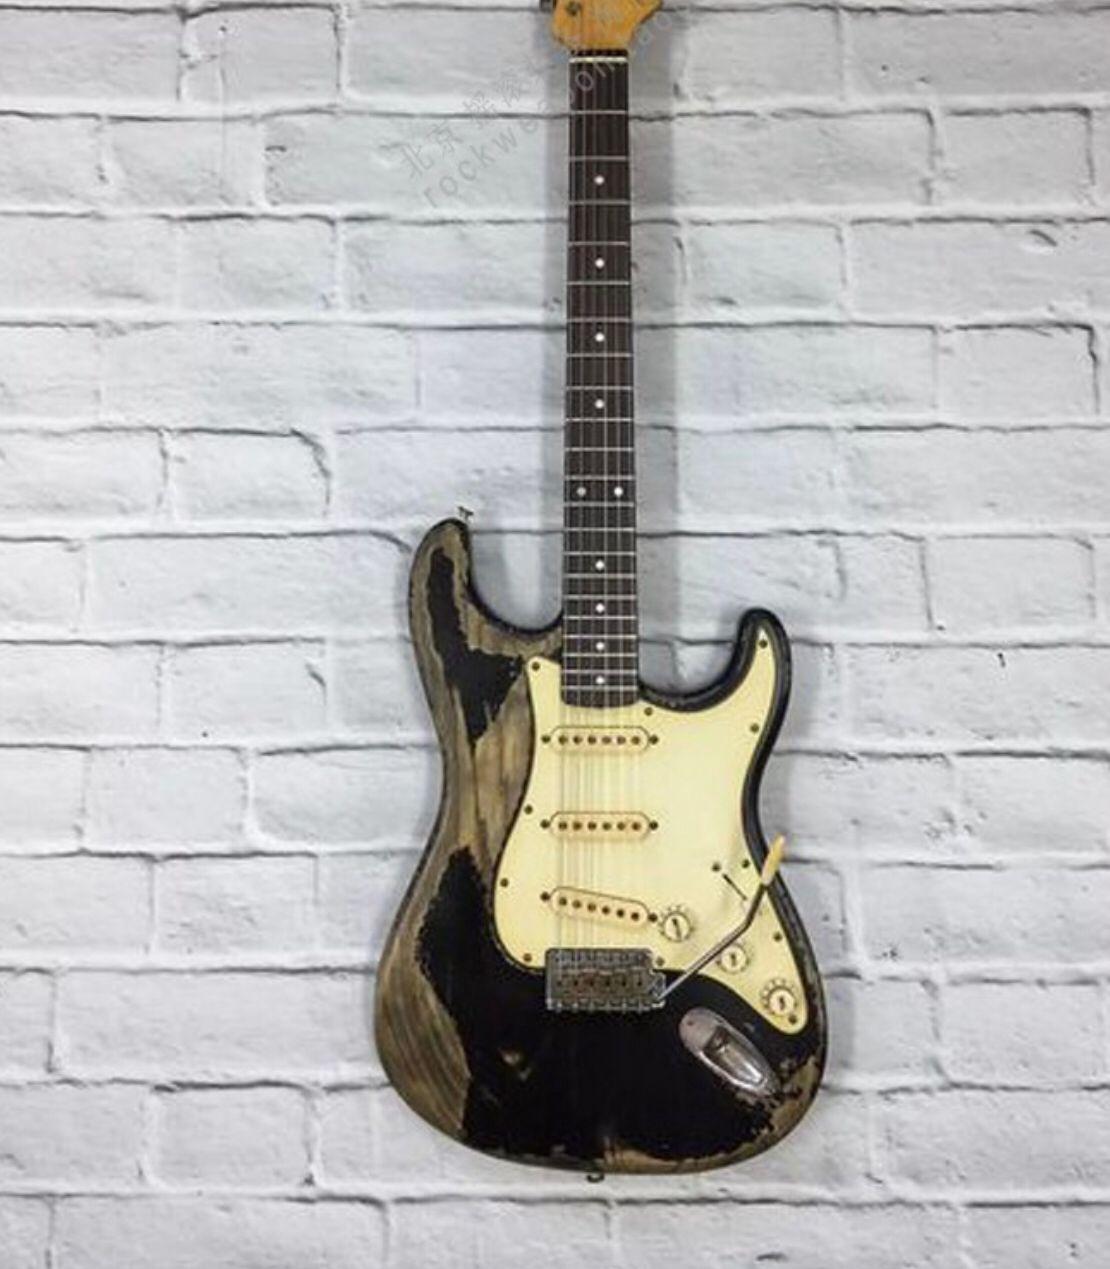 High quality Electric Guitar,relics rosewood fingerboard gitaar.relics by hands.black color guitarra.